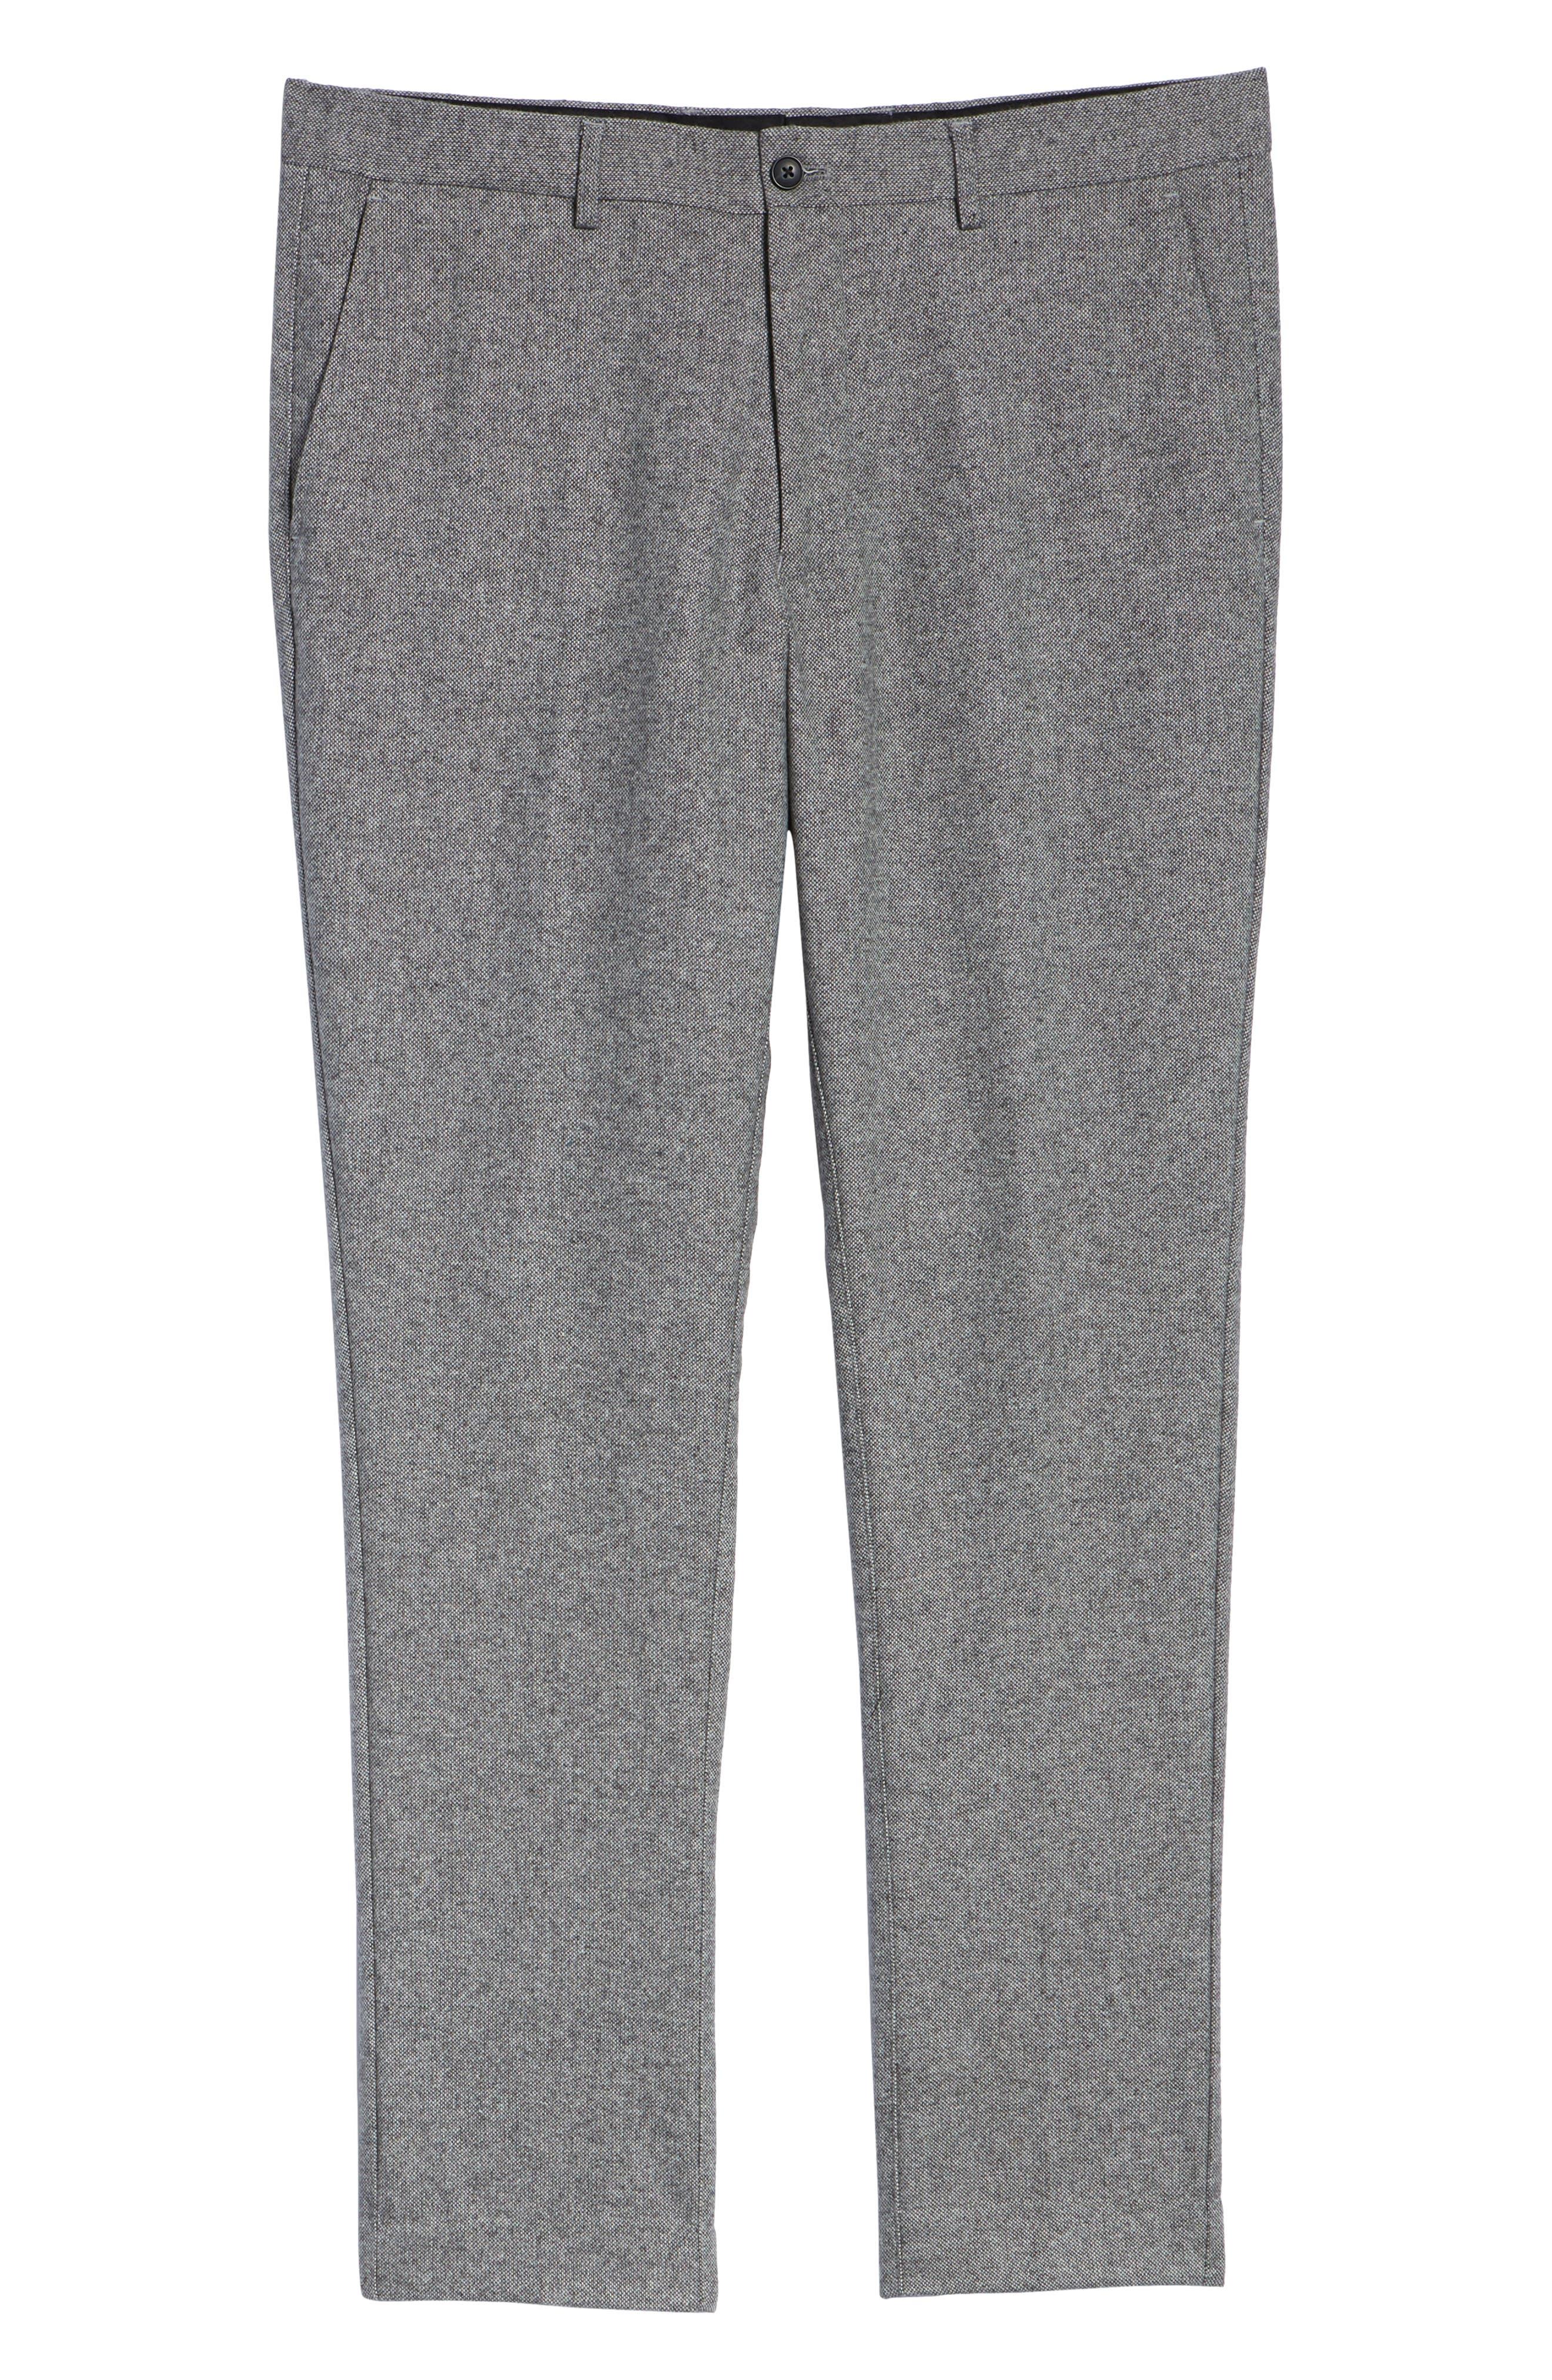 Phantom Slim Fit Pants,                             Alternate thumbnail 6, color,                             054